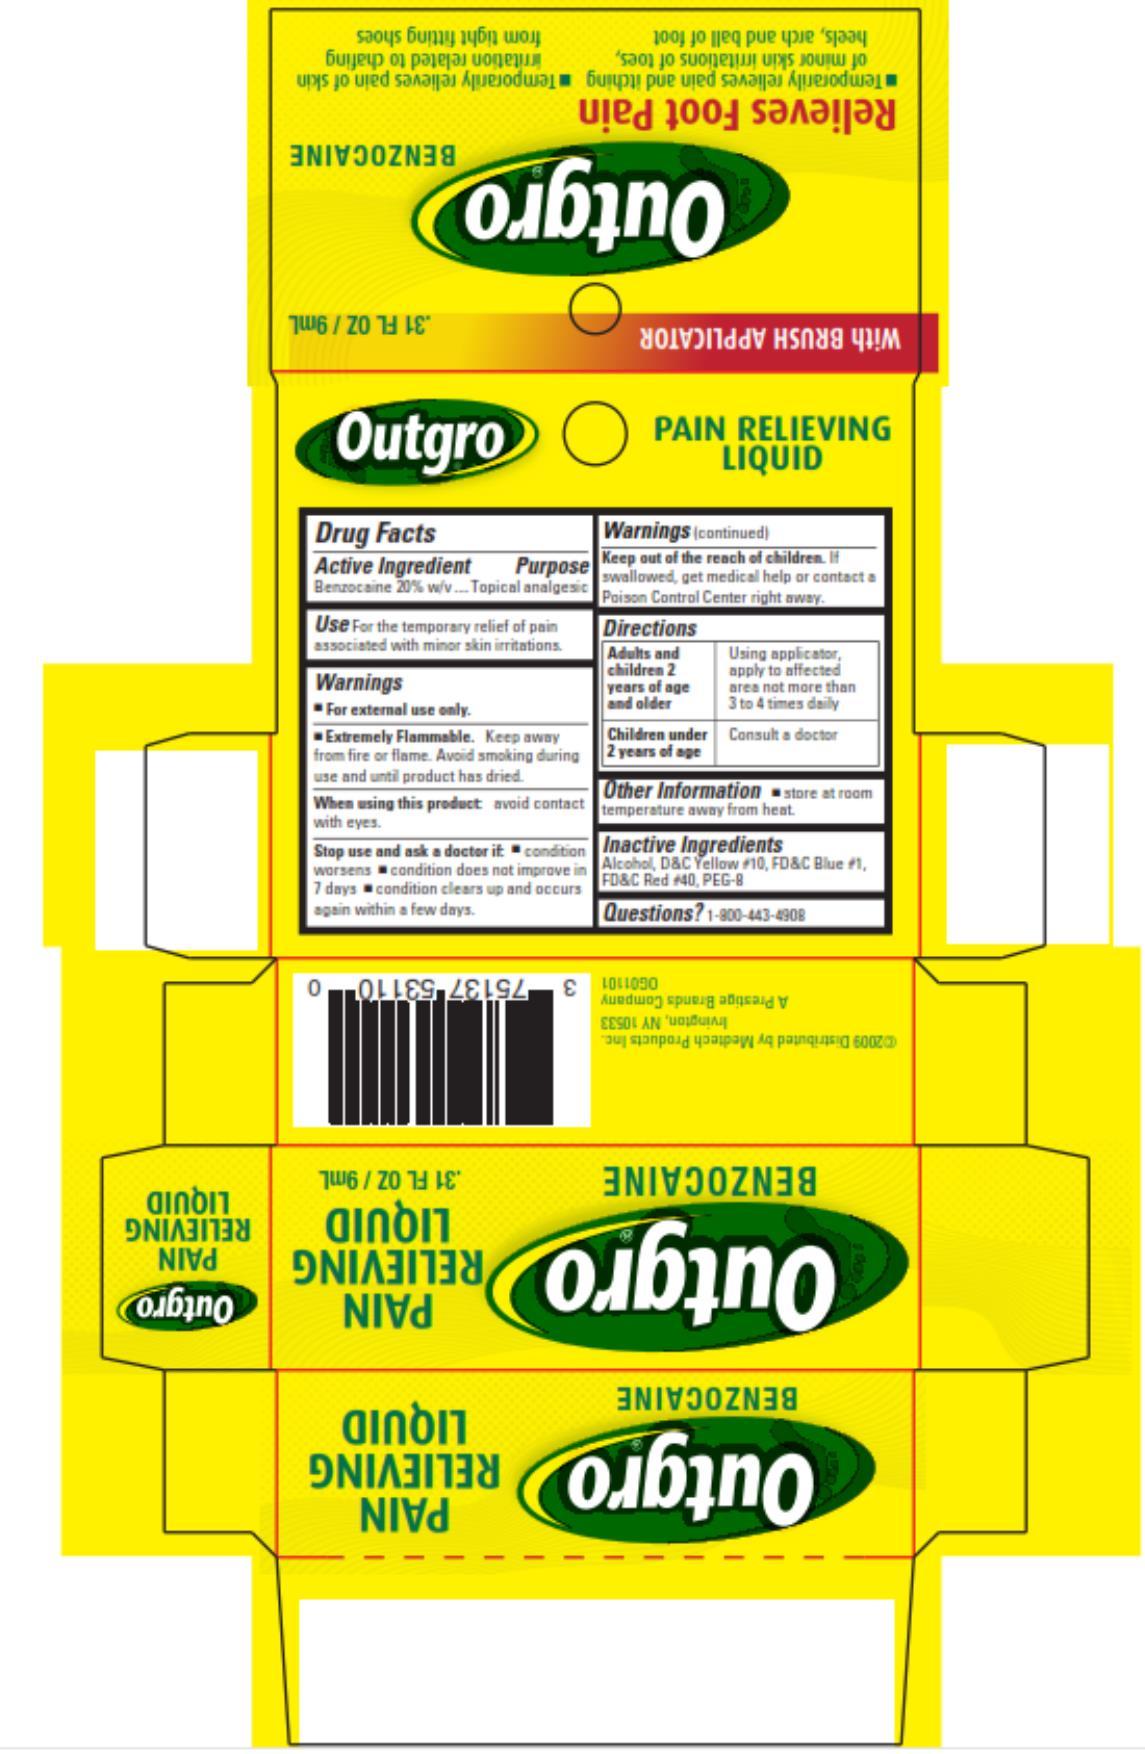 Outgro (Benzocaine) Liquid [Medtech Products Inc.]